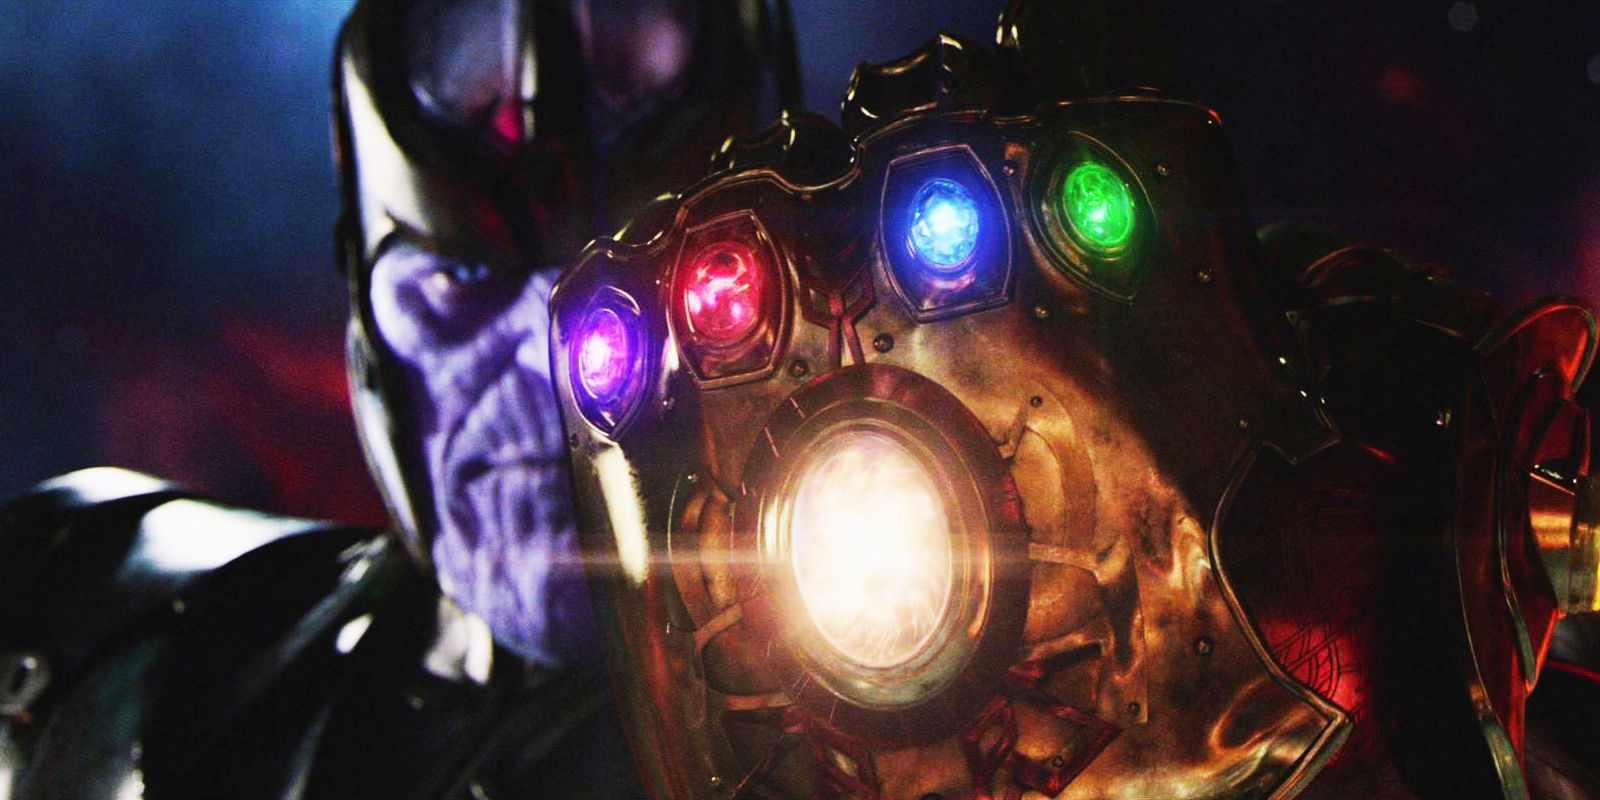 https://cinemaplanet.pt/wp-content/uploads/2016/09/avengers-infinity-war.jpg